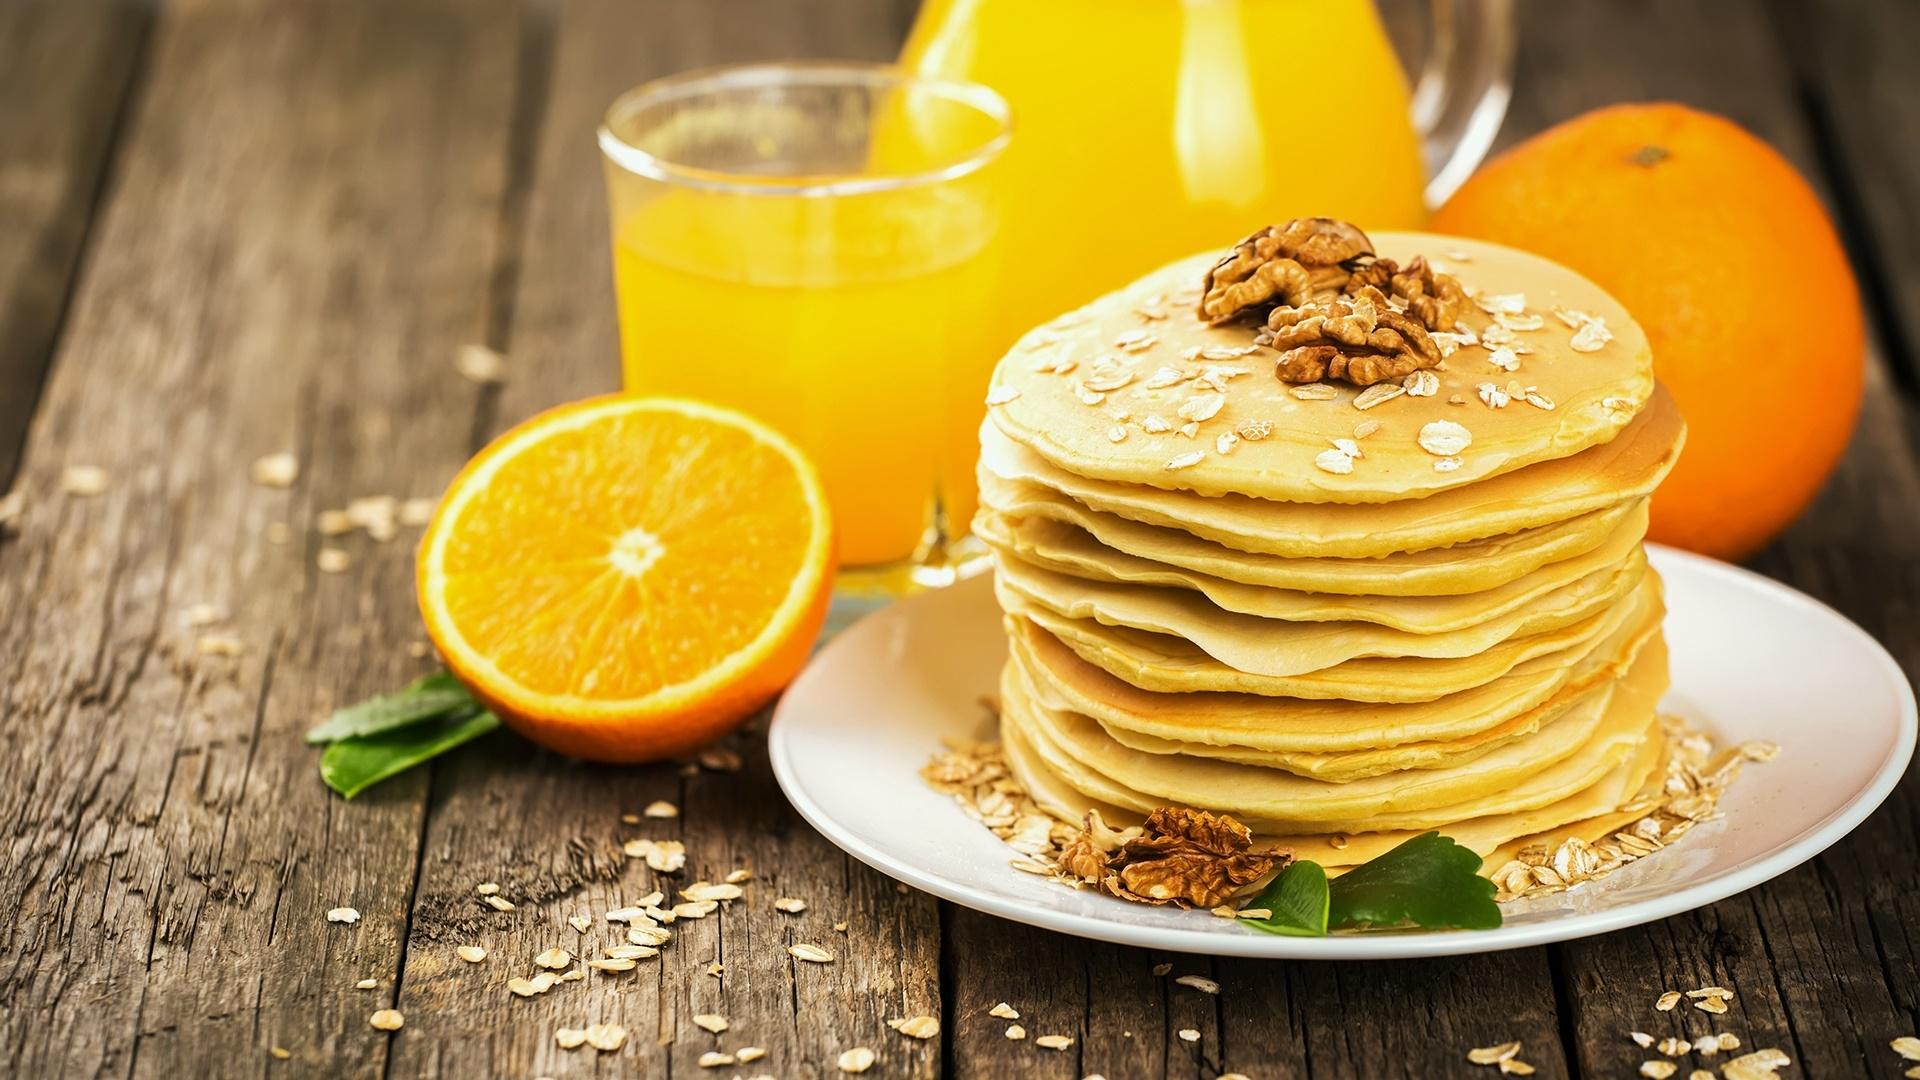 American pancakes with orange juice wallpaper